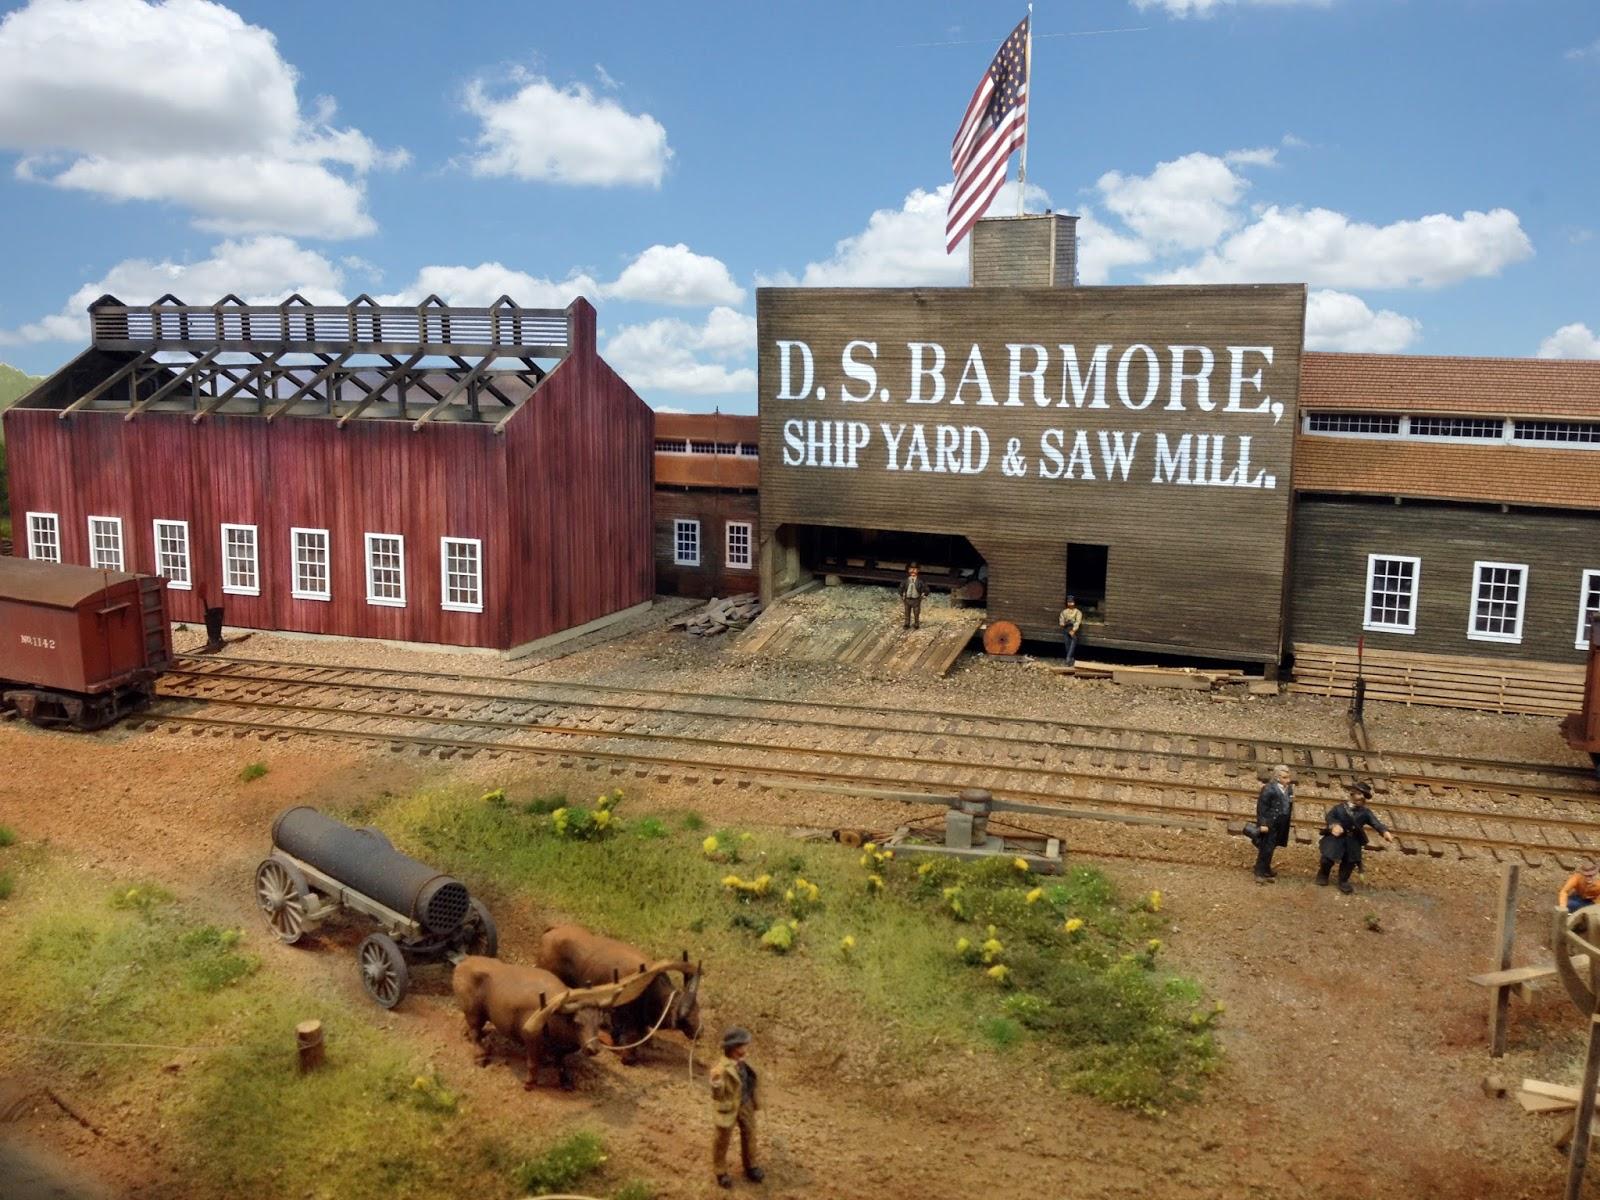 USMRR Aquia Line and other Model Railroad Adventures: July 2013